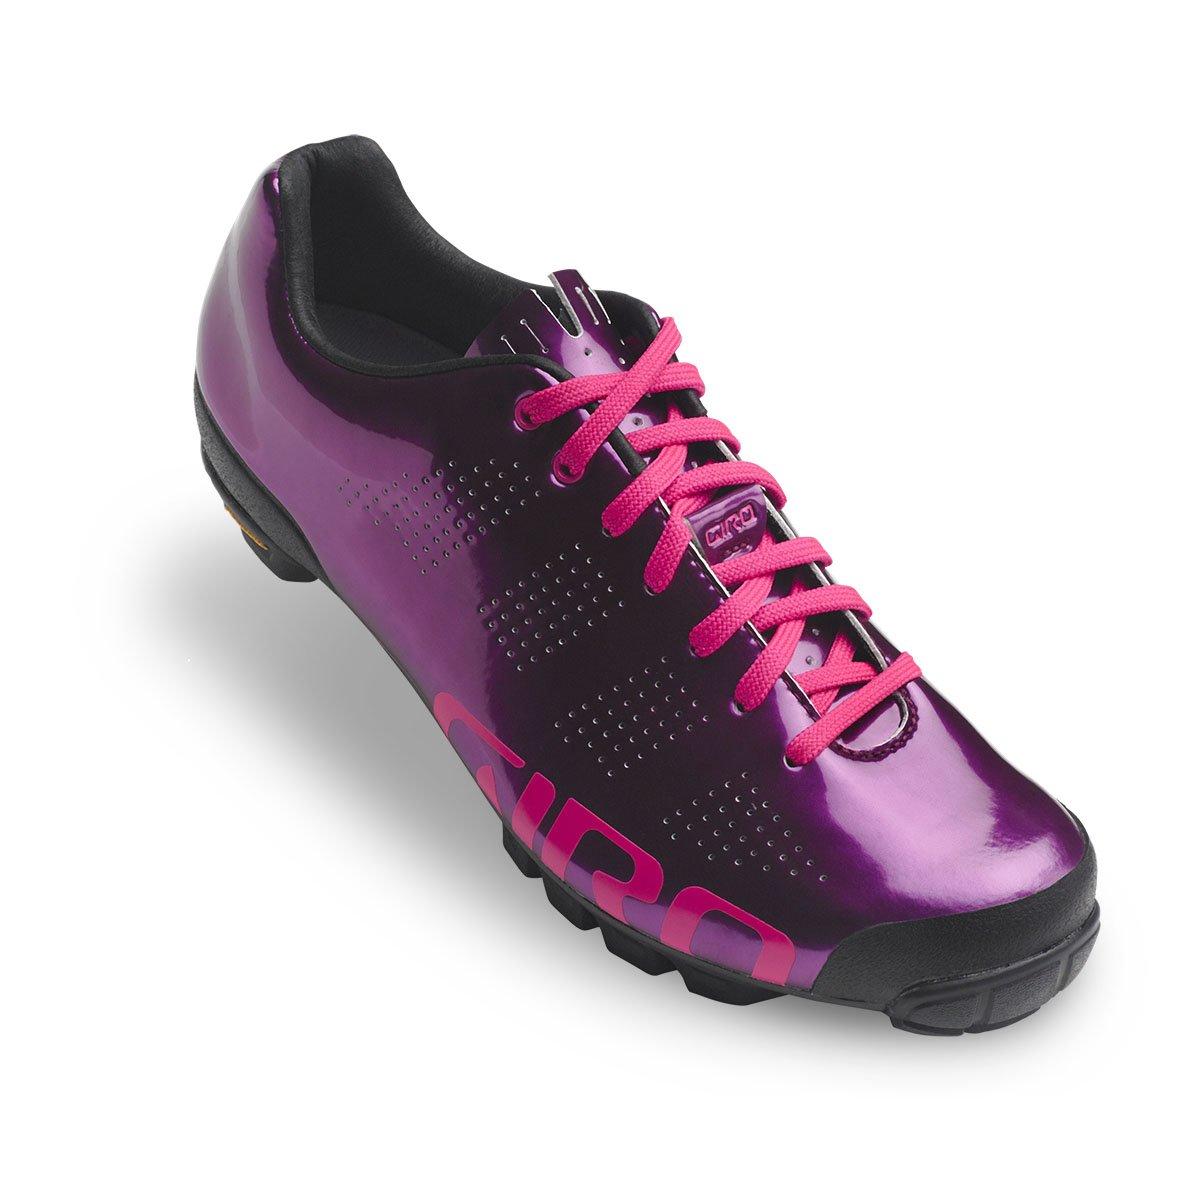 Giro 2017 Womens Empire W vr90汚れサイクリング靴 B01M8GOL3J 37.5 EU|Berry / Bright Pink Berry / Bright Pink 37.5 EU